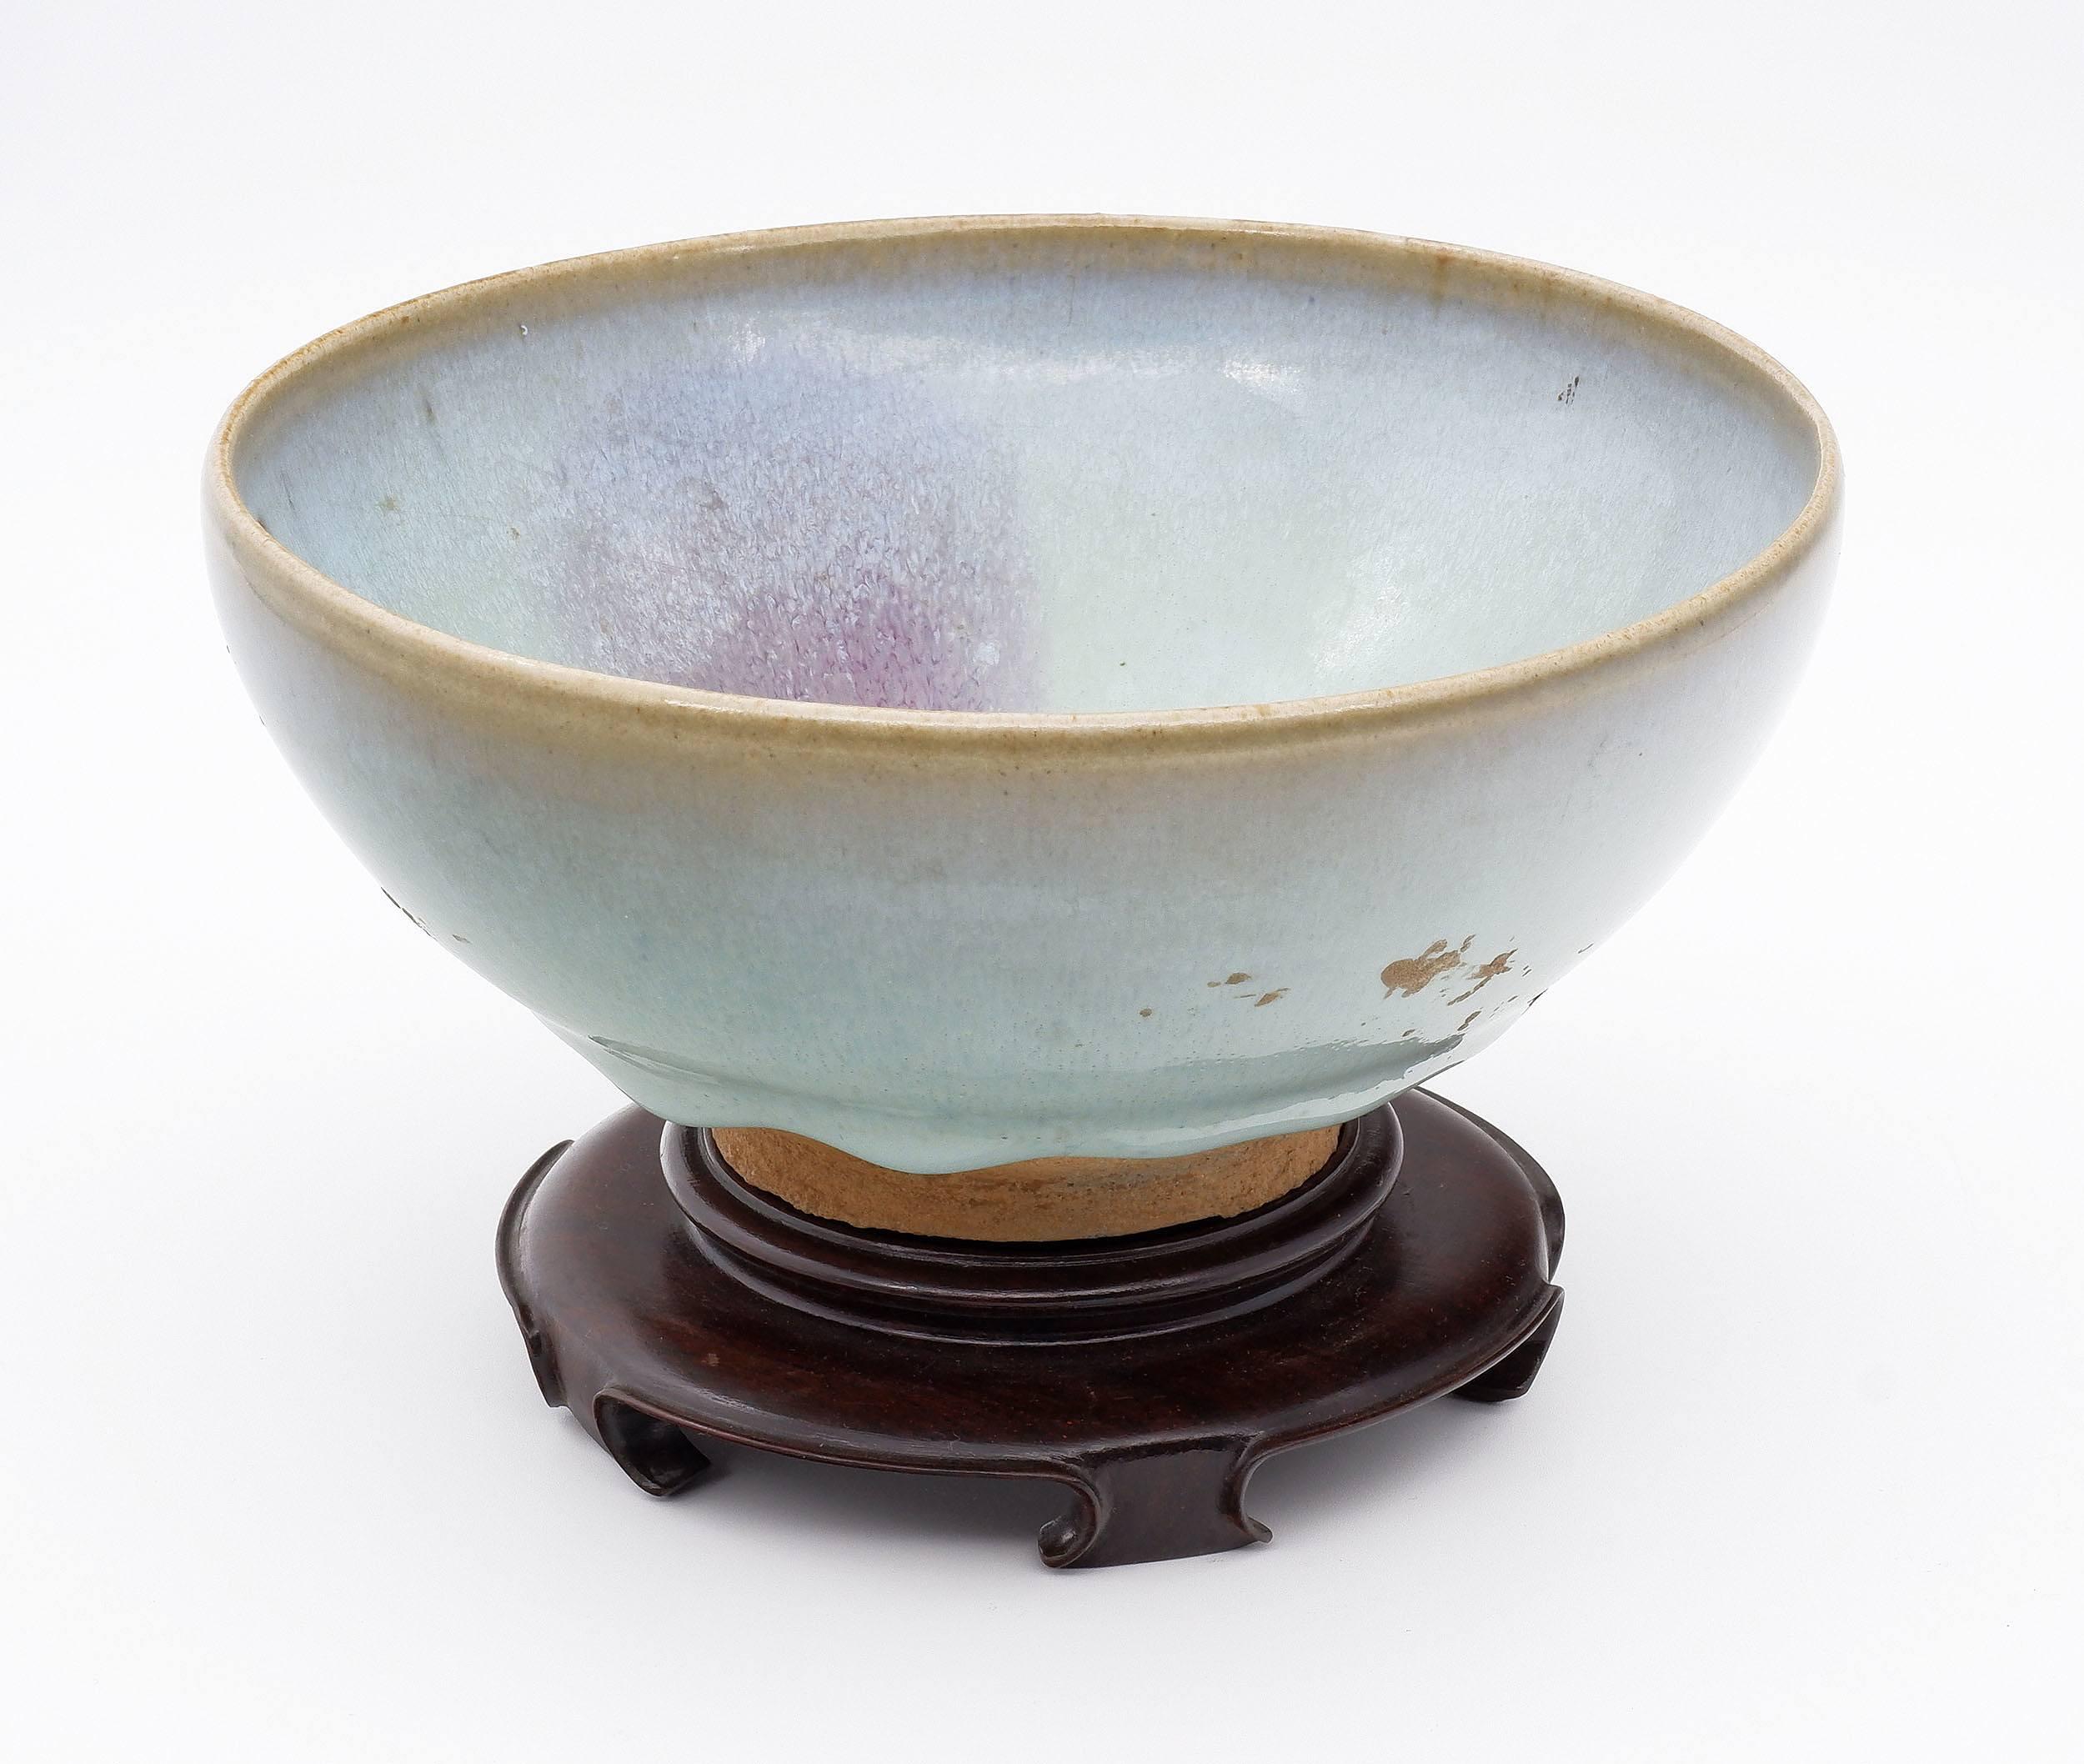 'Chinese Junyao Chun Glaze Bowl with Purple Splash, Possibly Jin to Ming Dynasty'